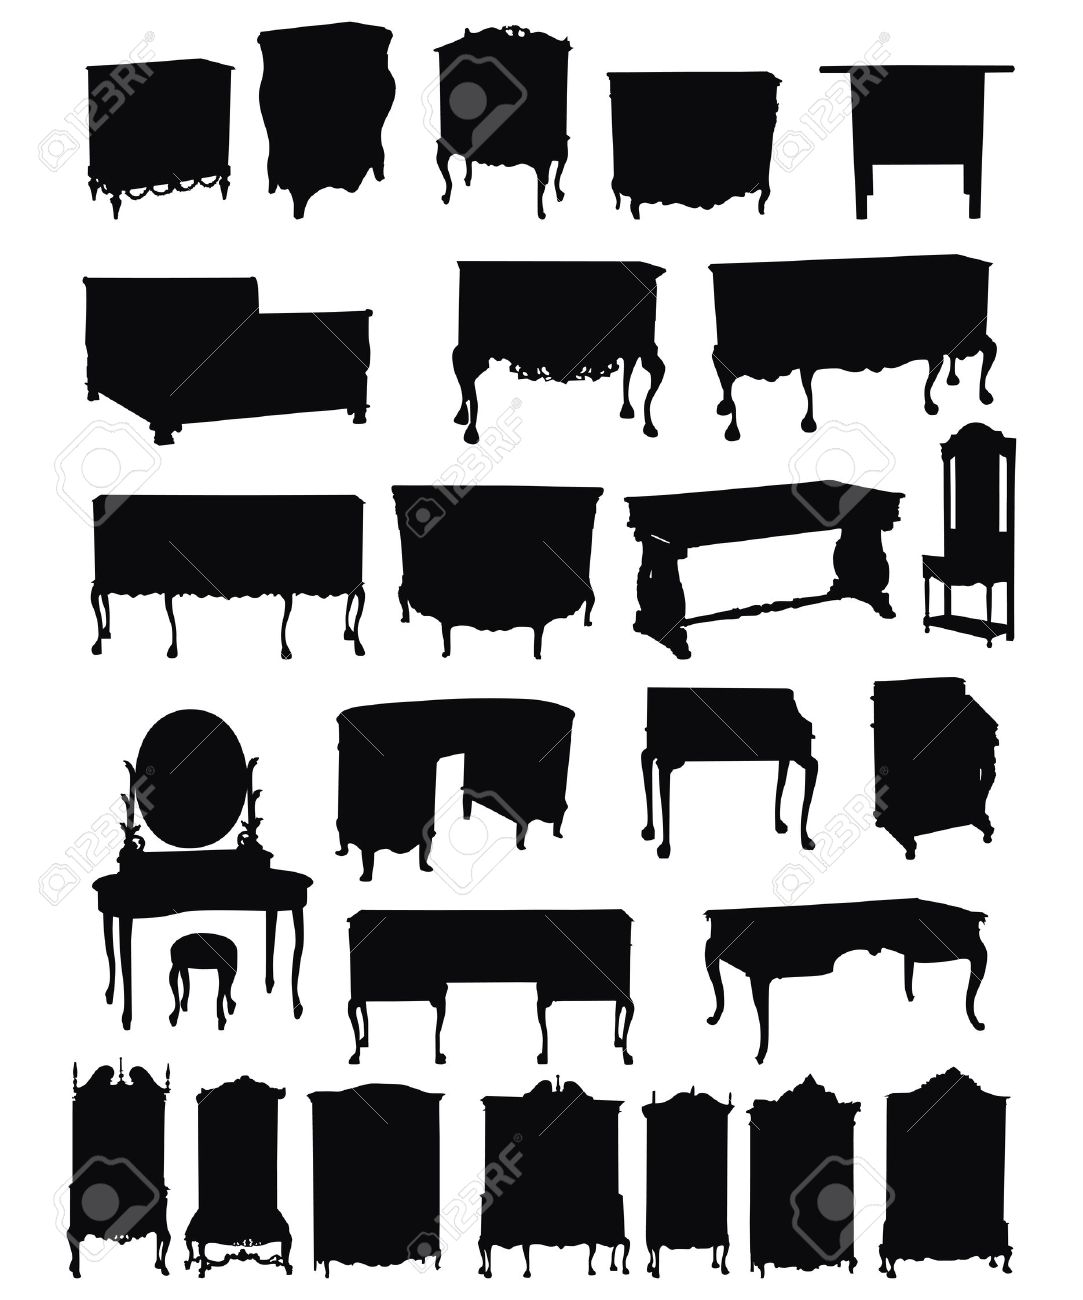 Antique chair silhouette - Antique Furniture Illustrations Of Antique Furniture Silhouettes On A White Background